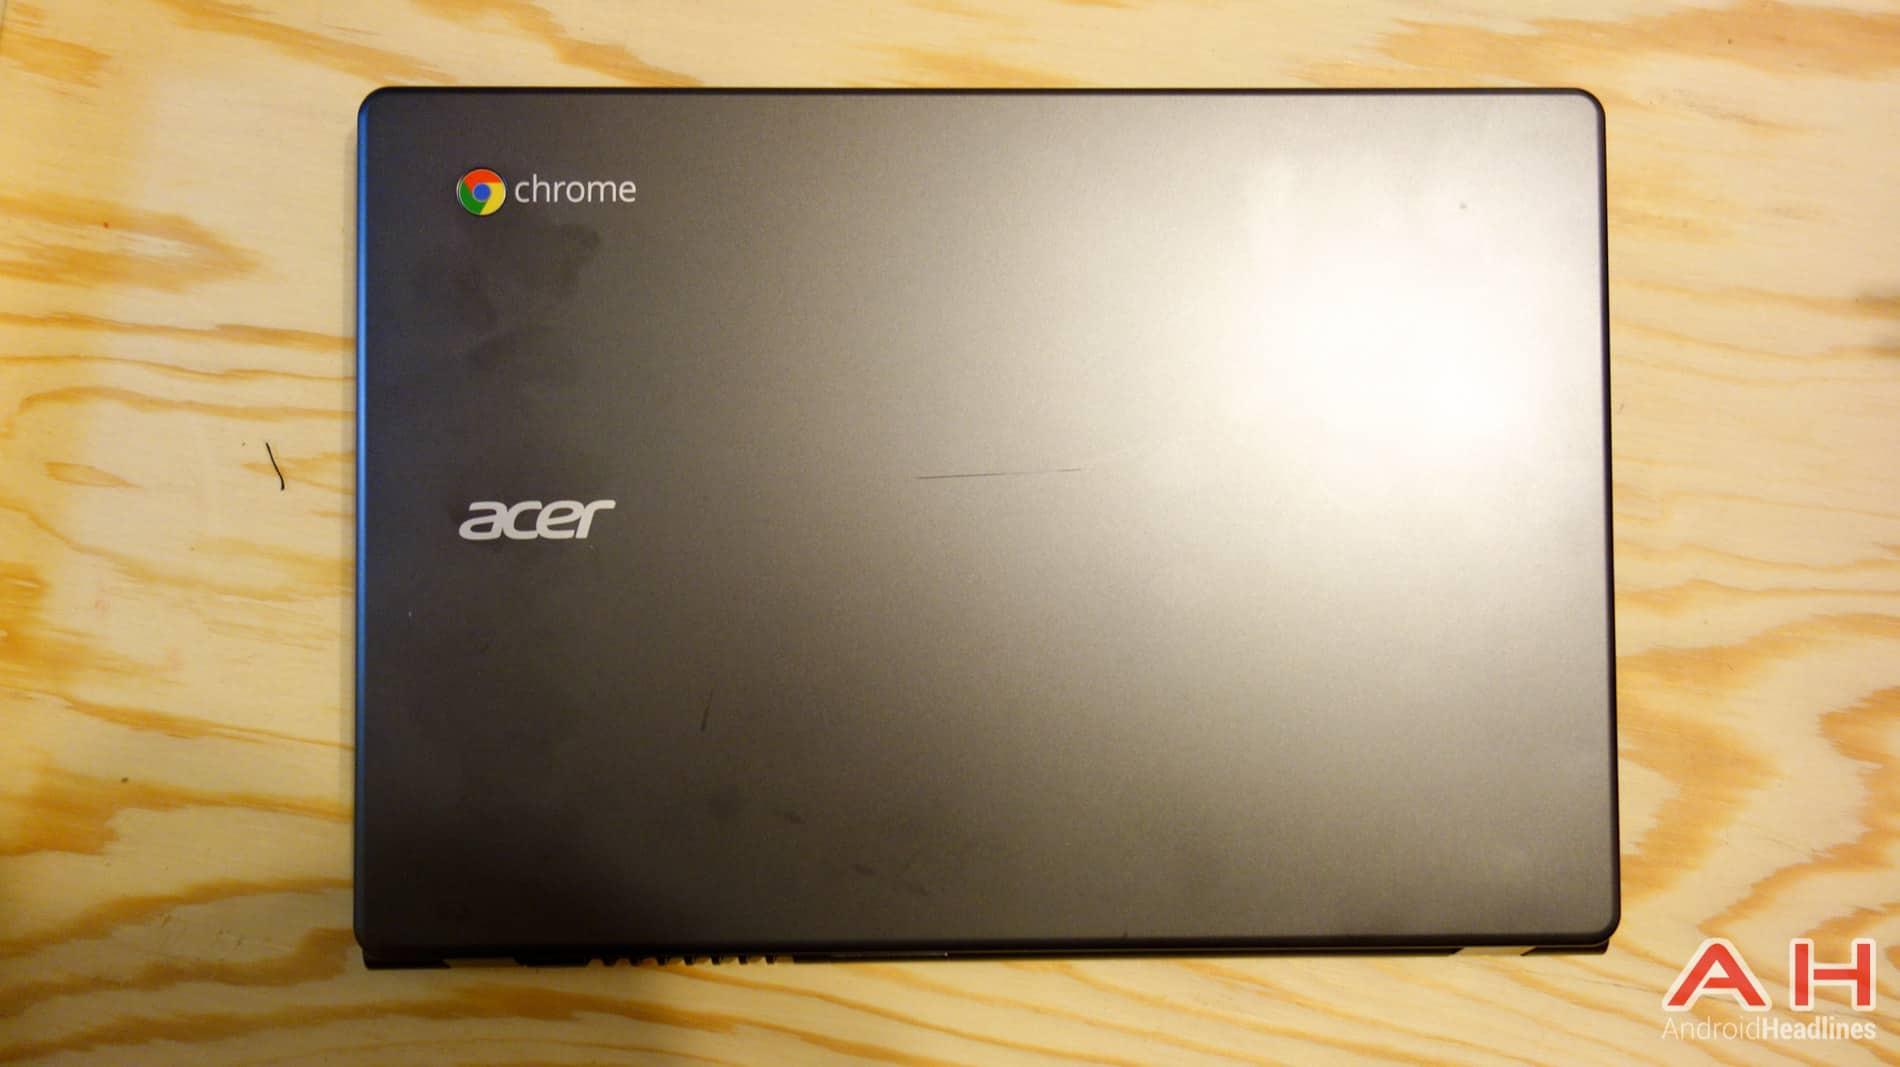 Acer-C720-i3-Chromebook-AH-4